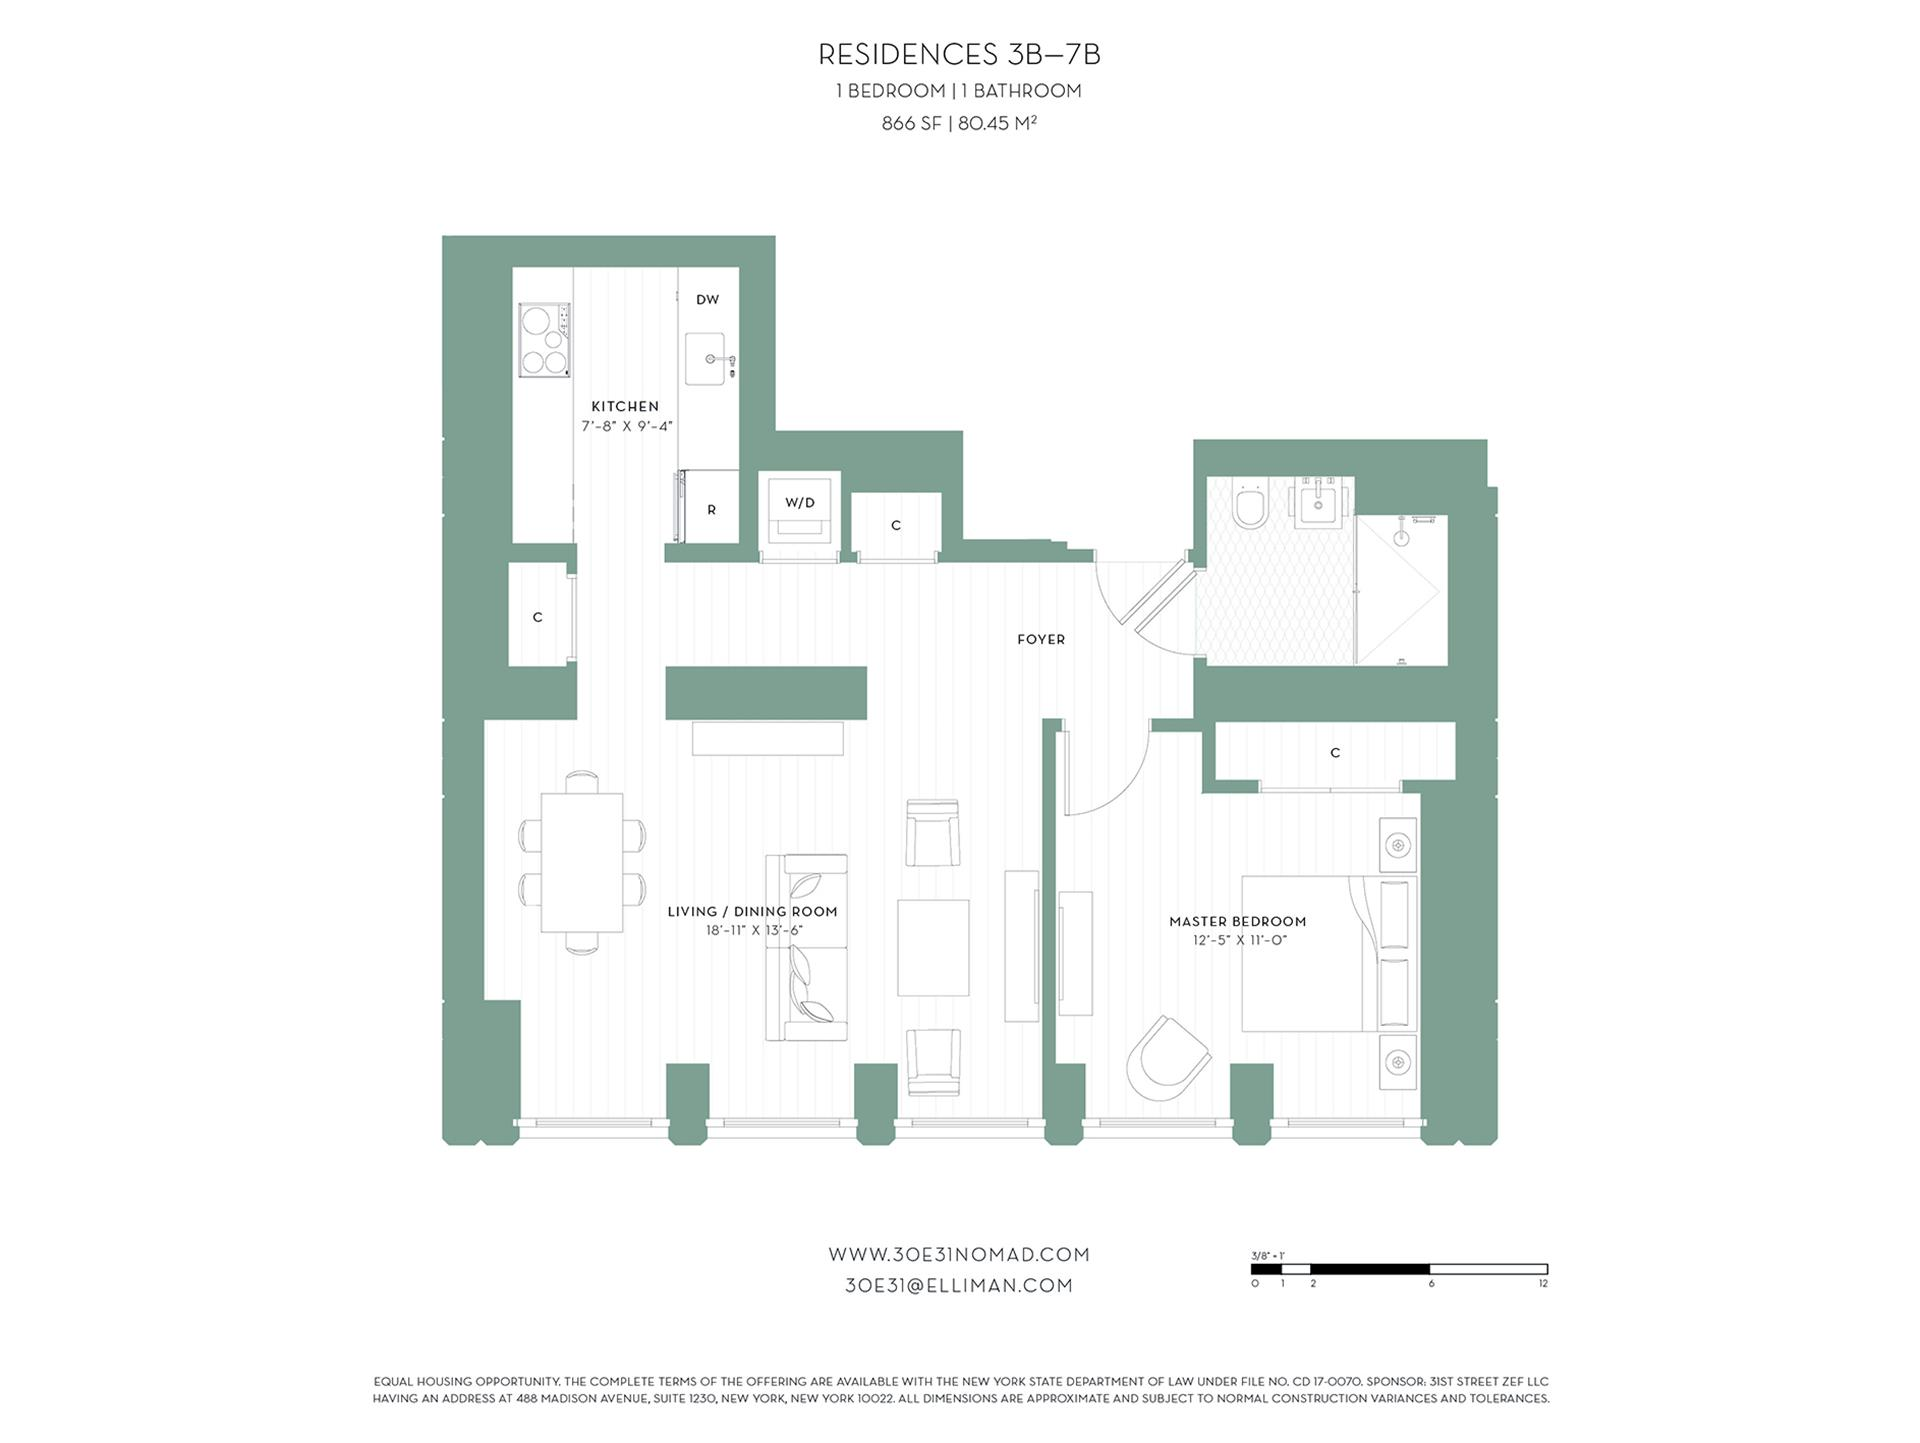 Floor plan of 30 East 31st Street, 3B - Midtown, New York